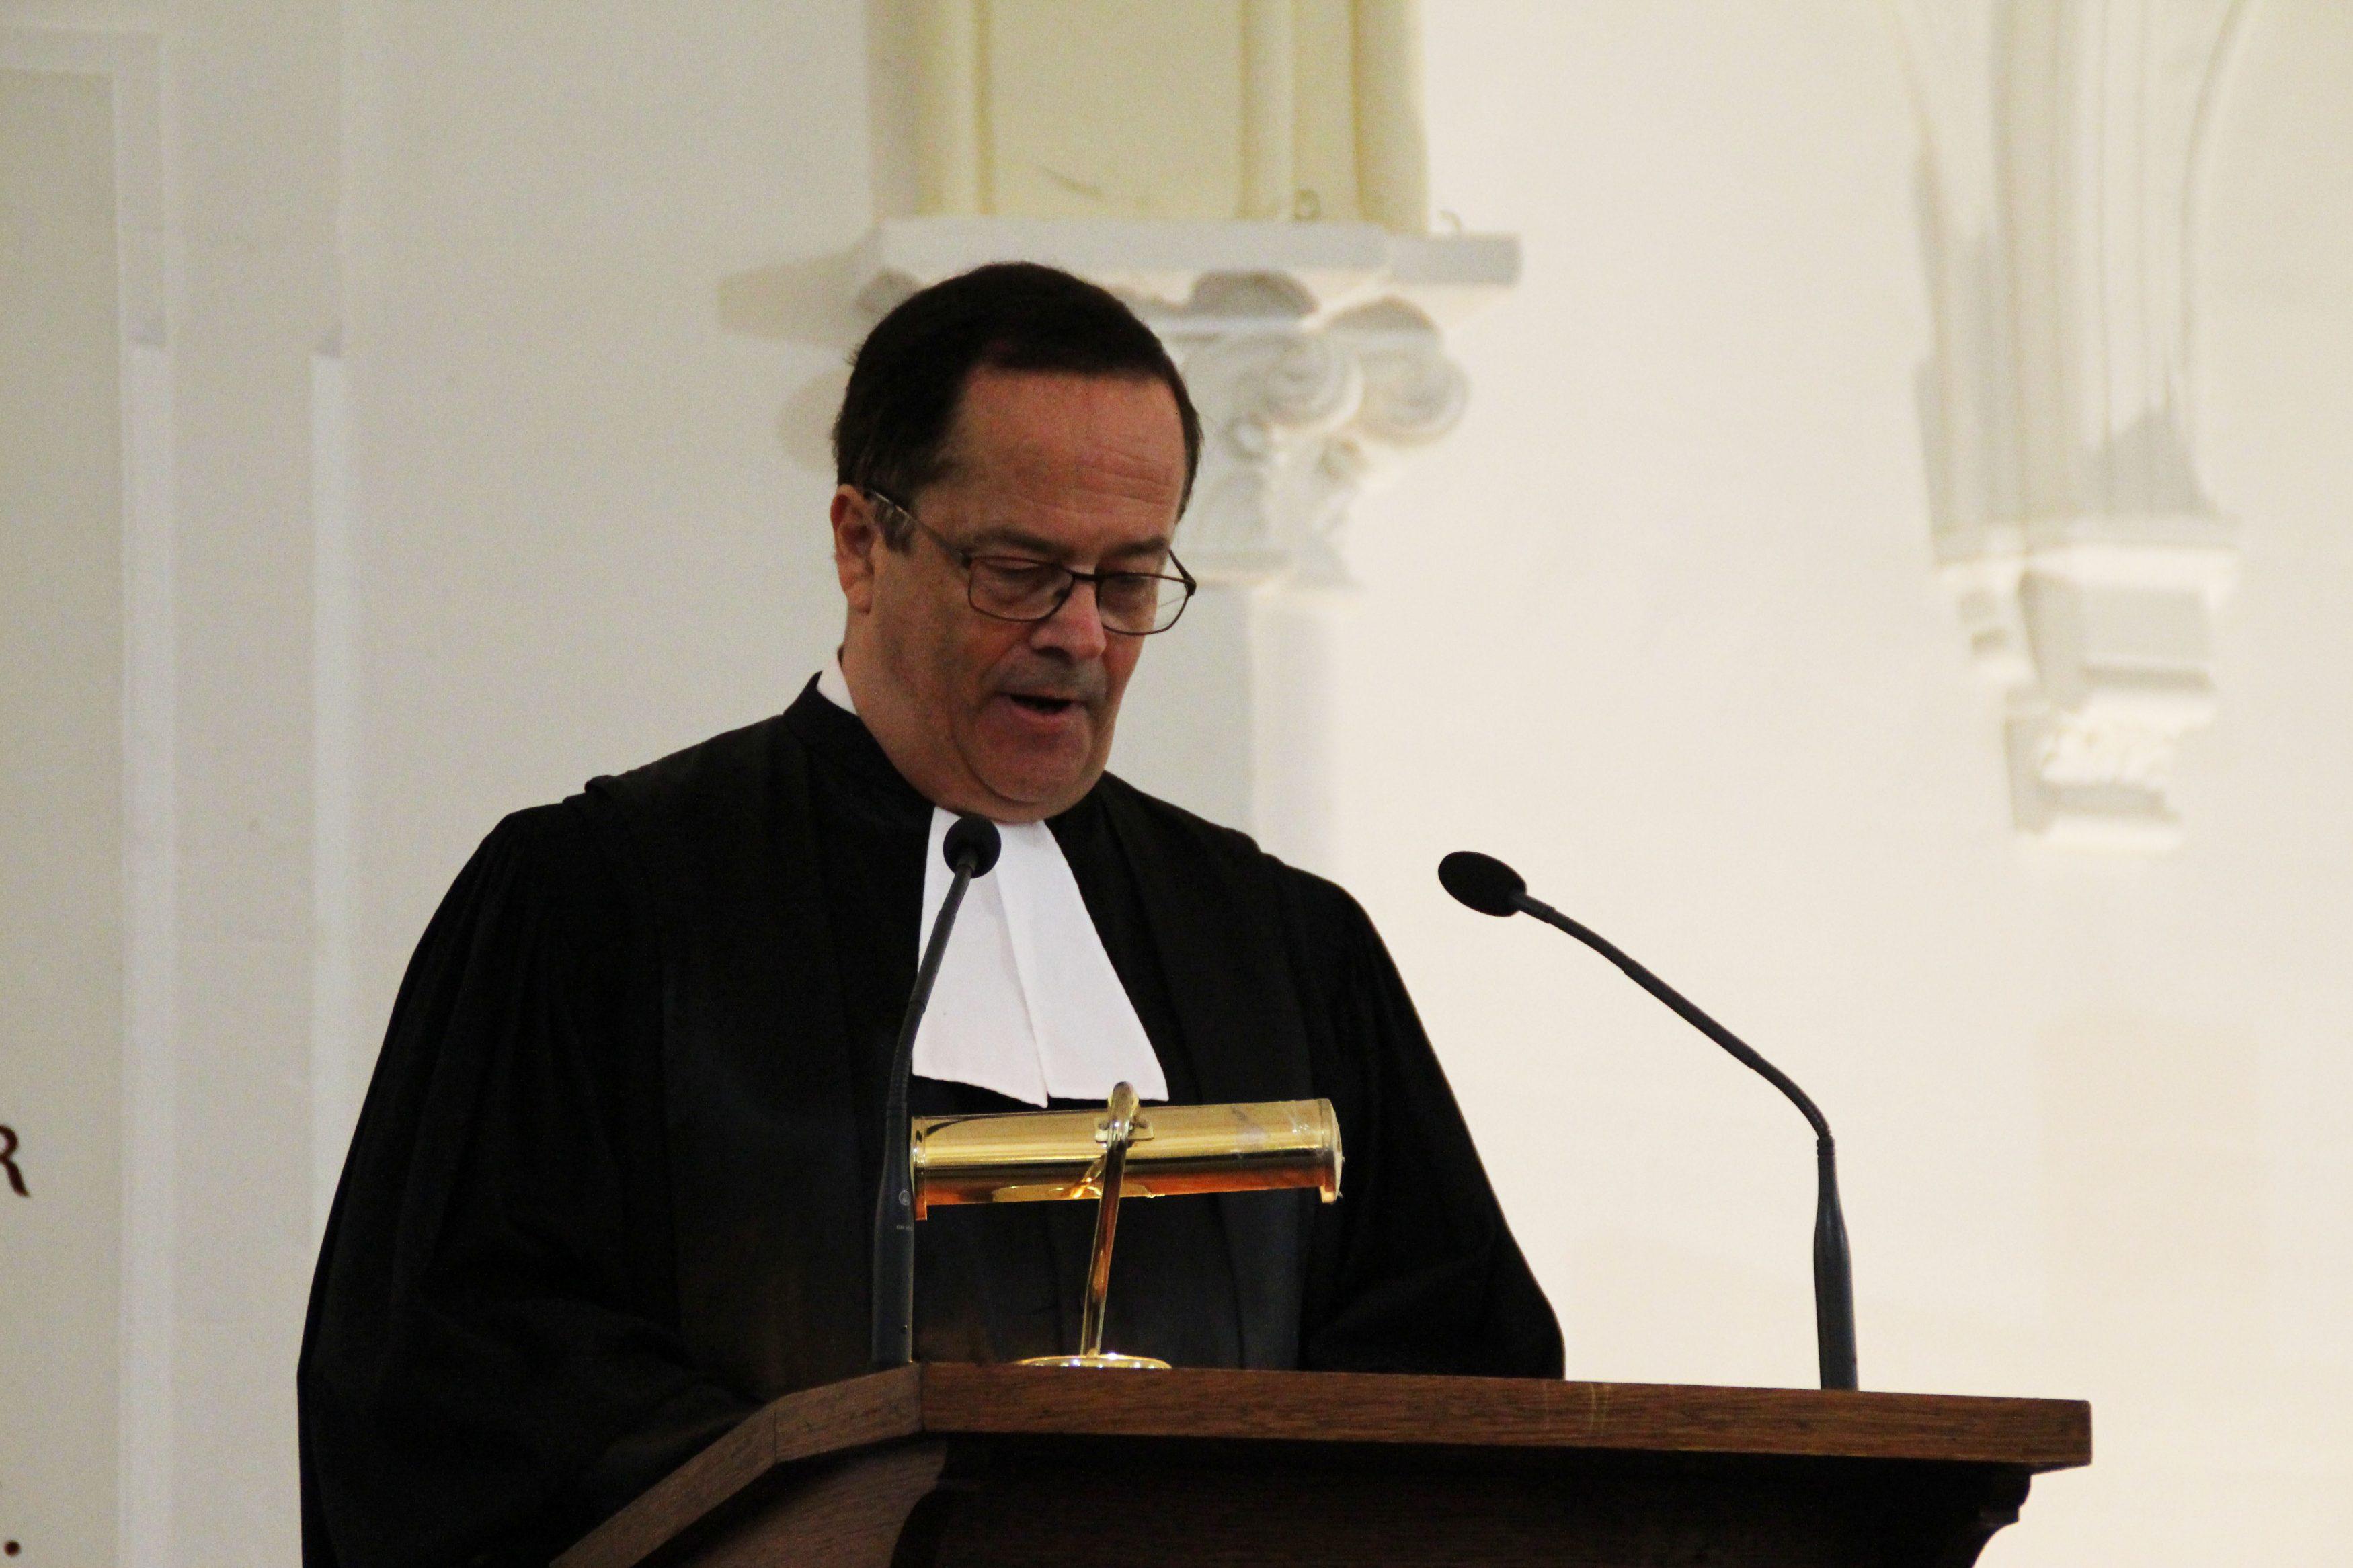 2017/11/pasteur-debourqueney-predication-e1512575044225.jpg